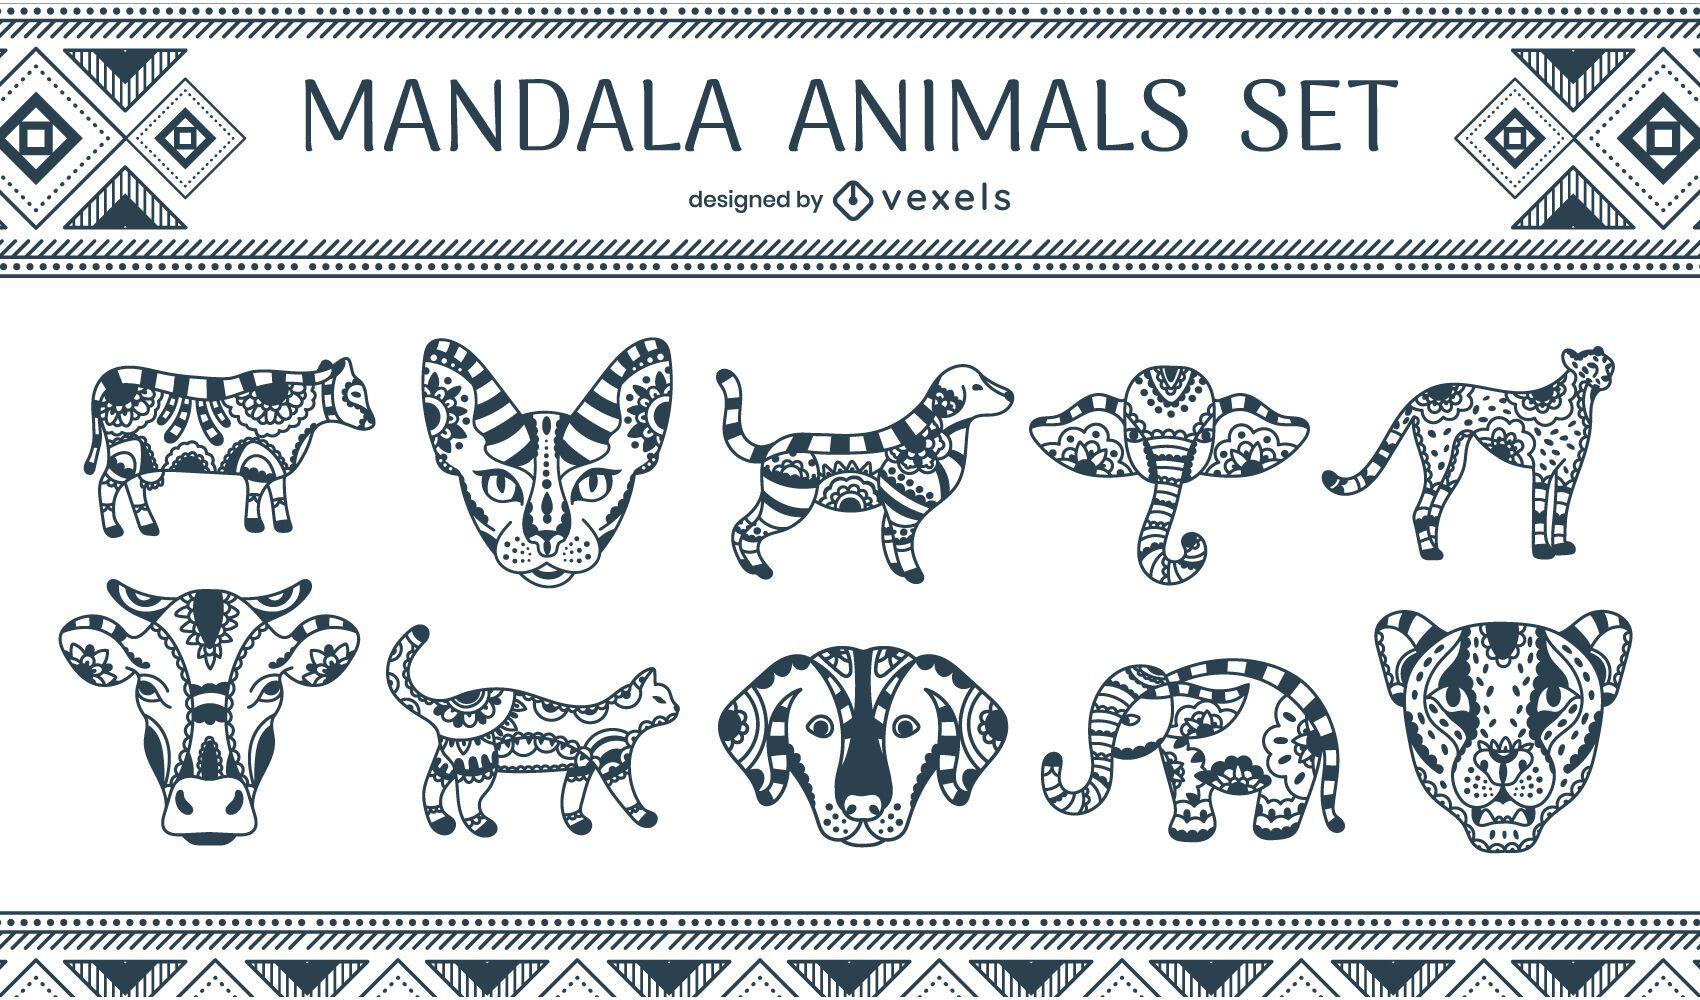 Mandala animals set